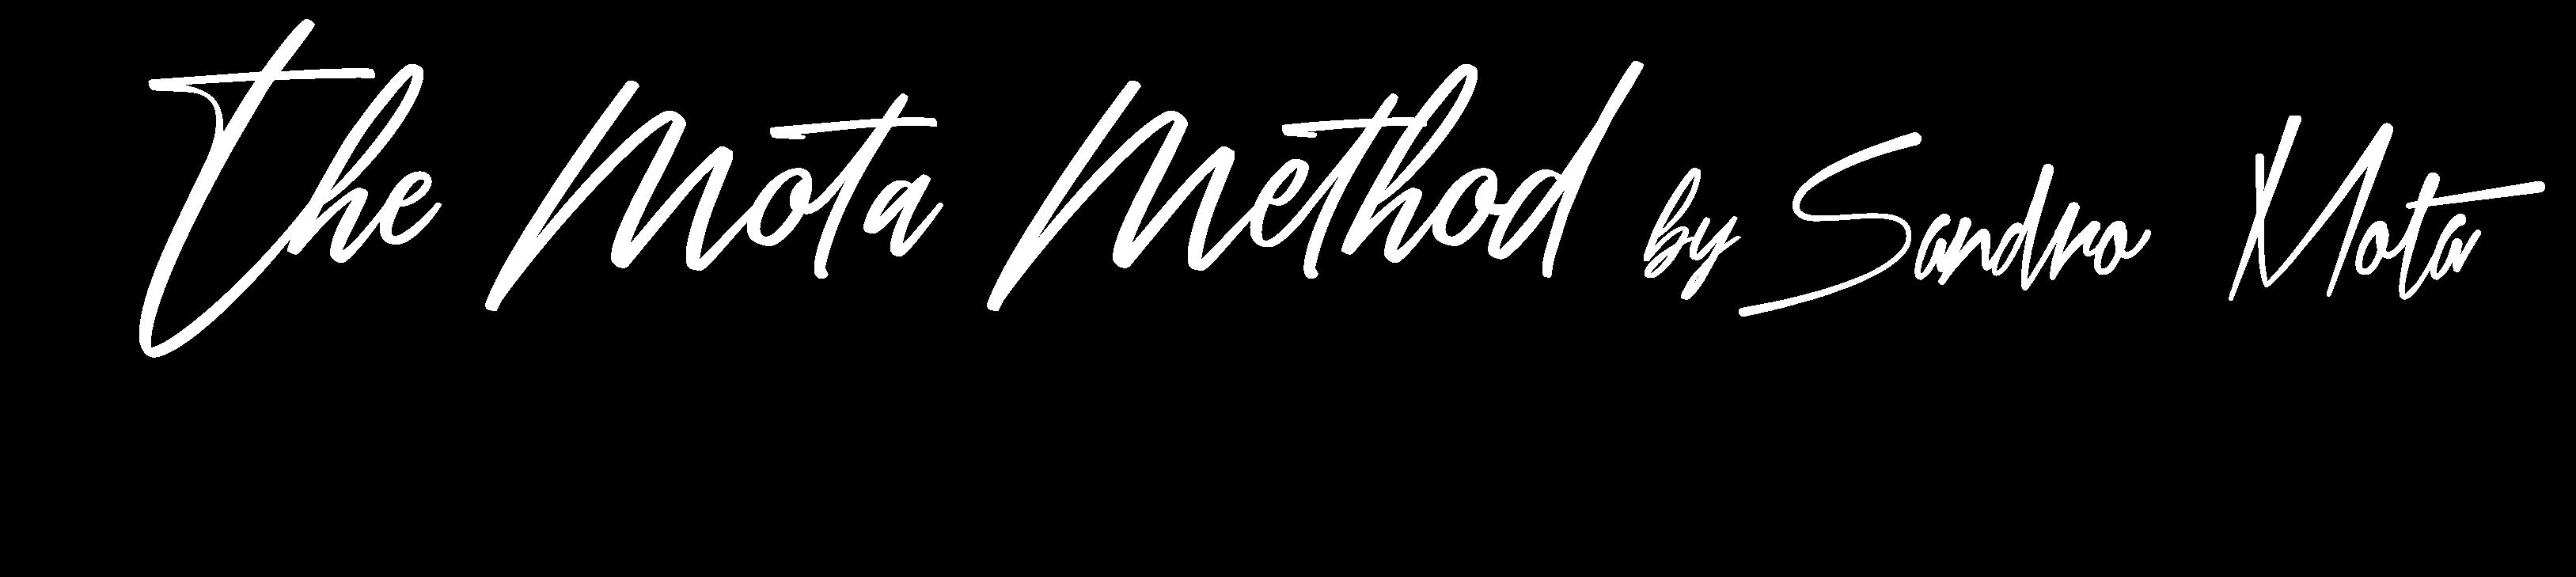 The Mota Method